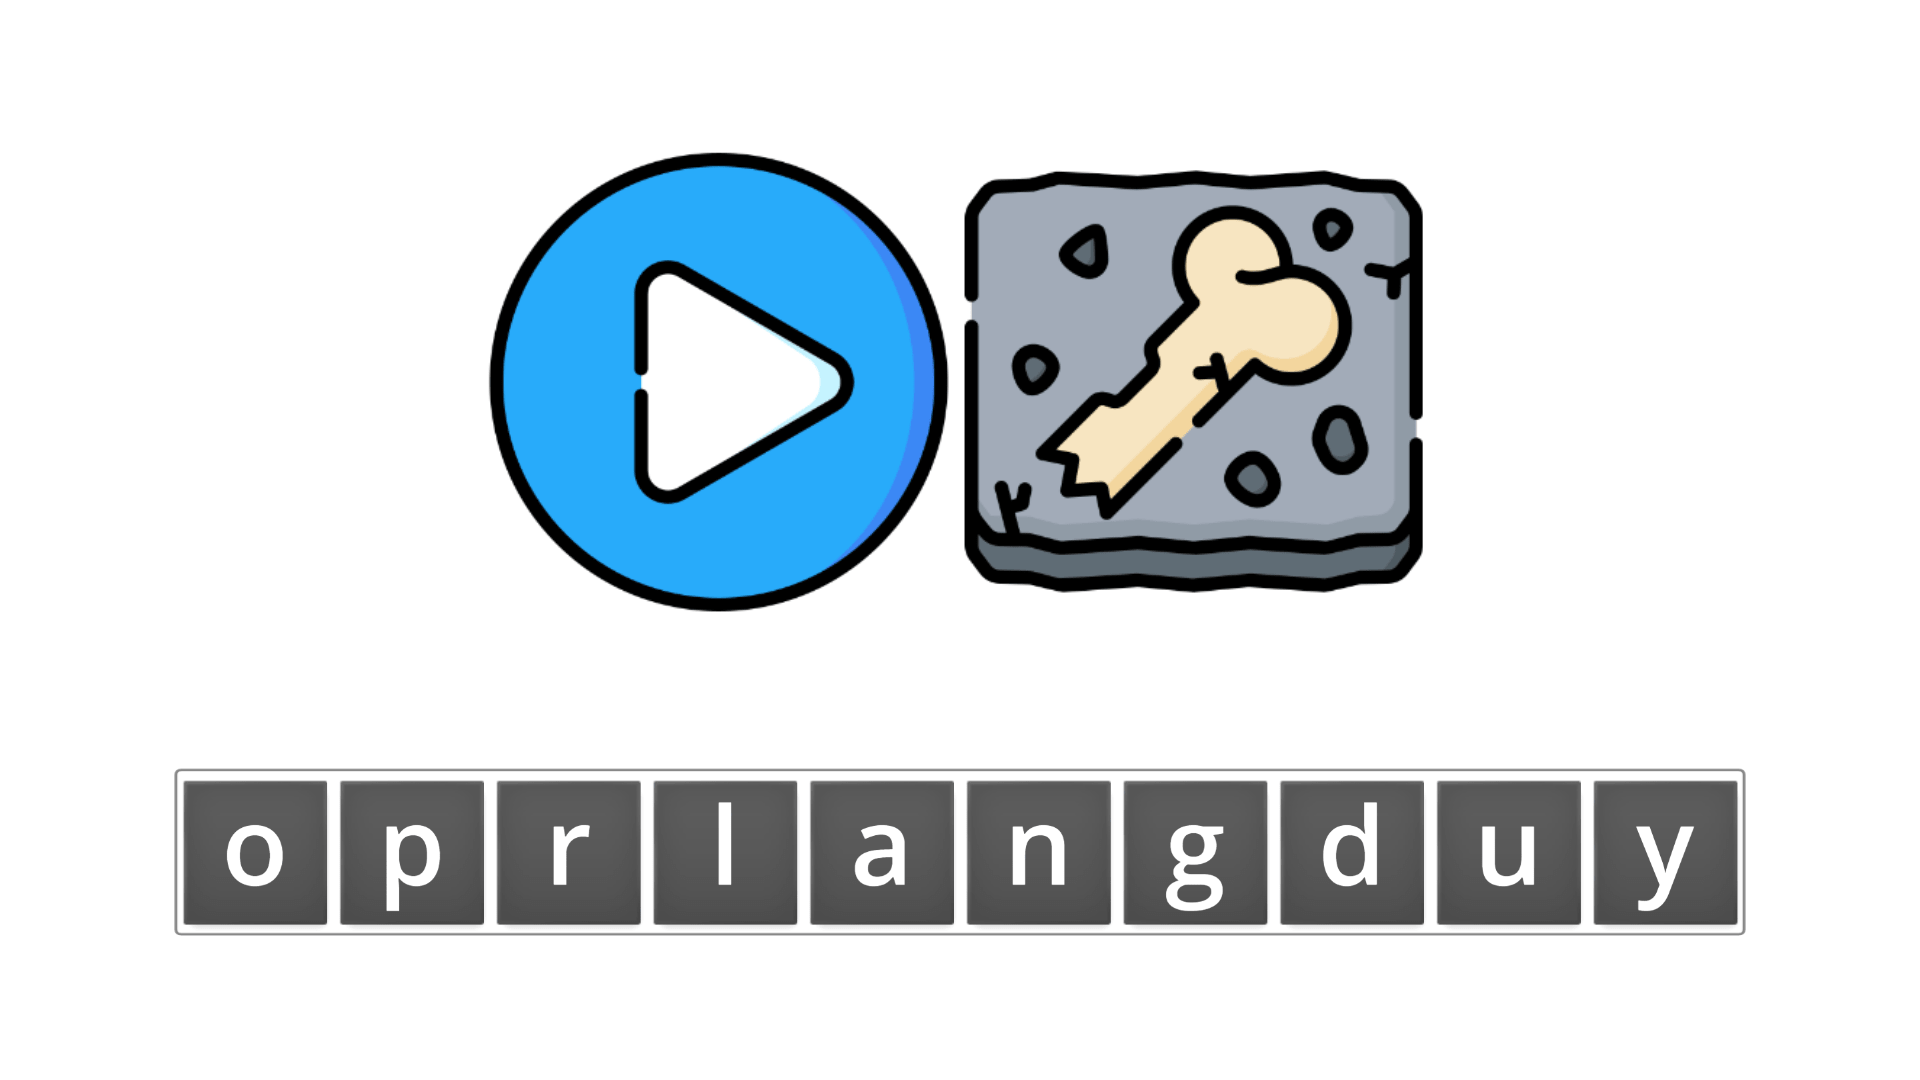 esl resources - flashcards - compound nouns  - unscramble - playground